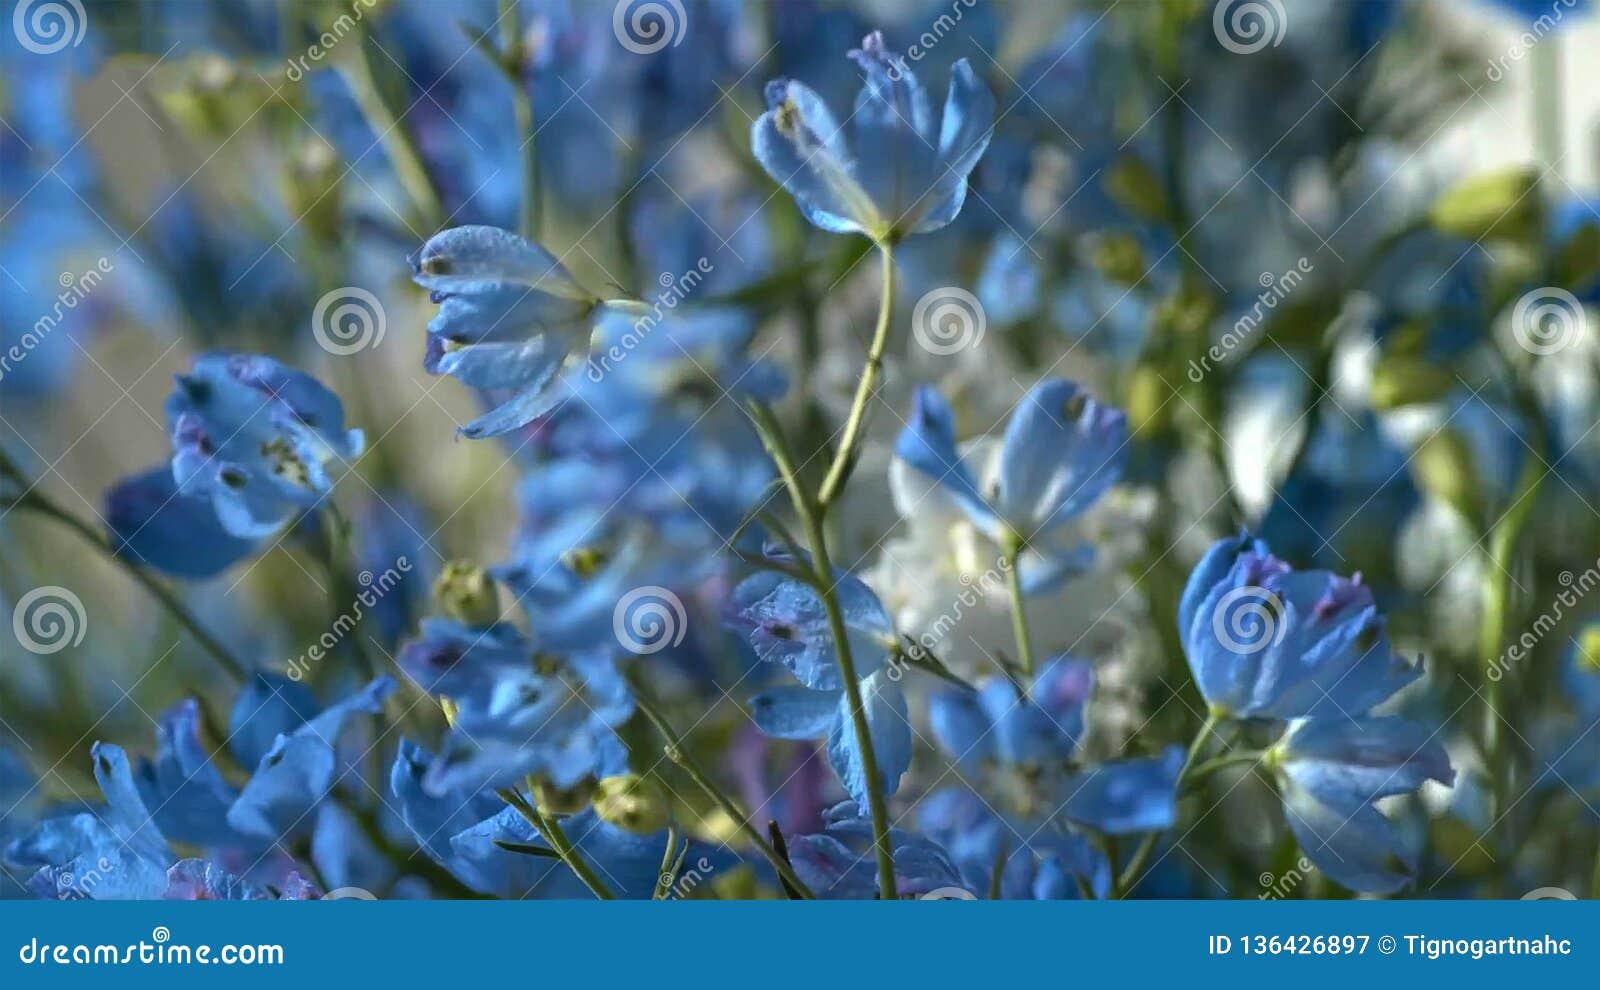 Blauwe bloem - Beeld